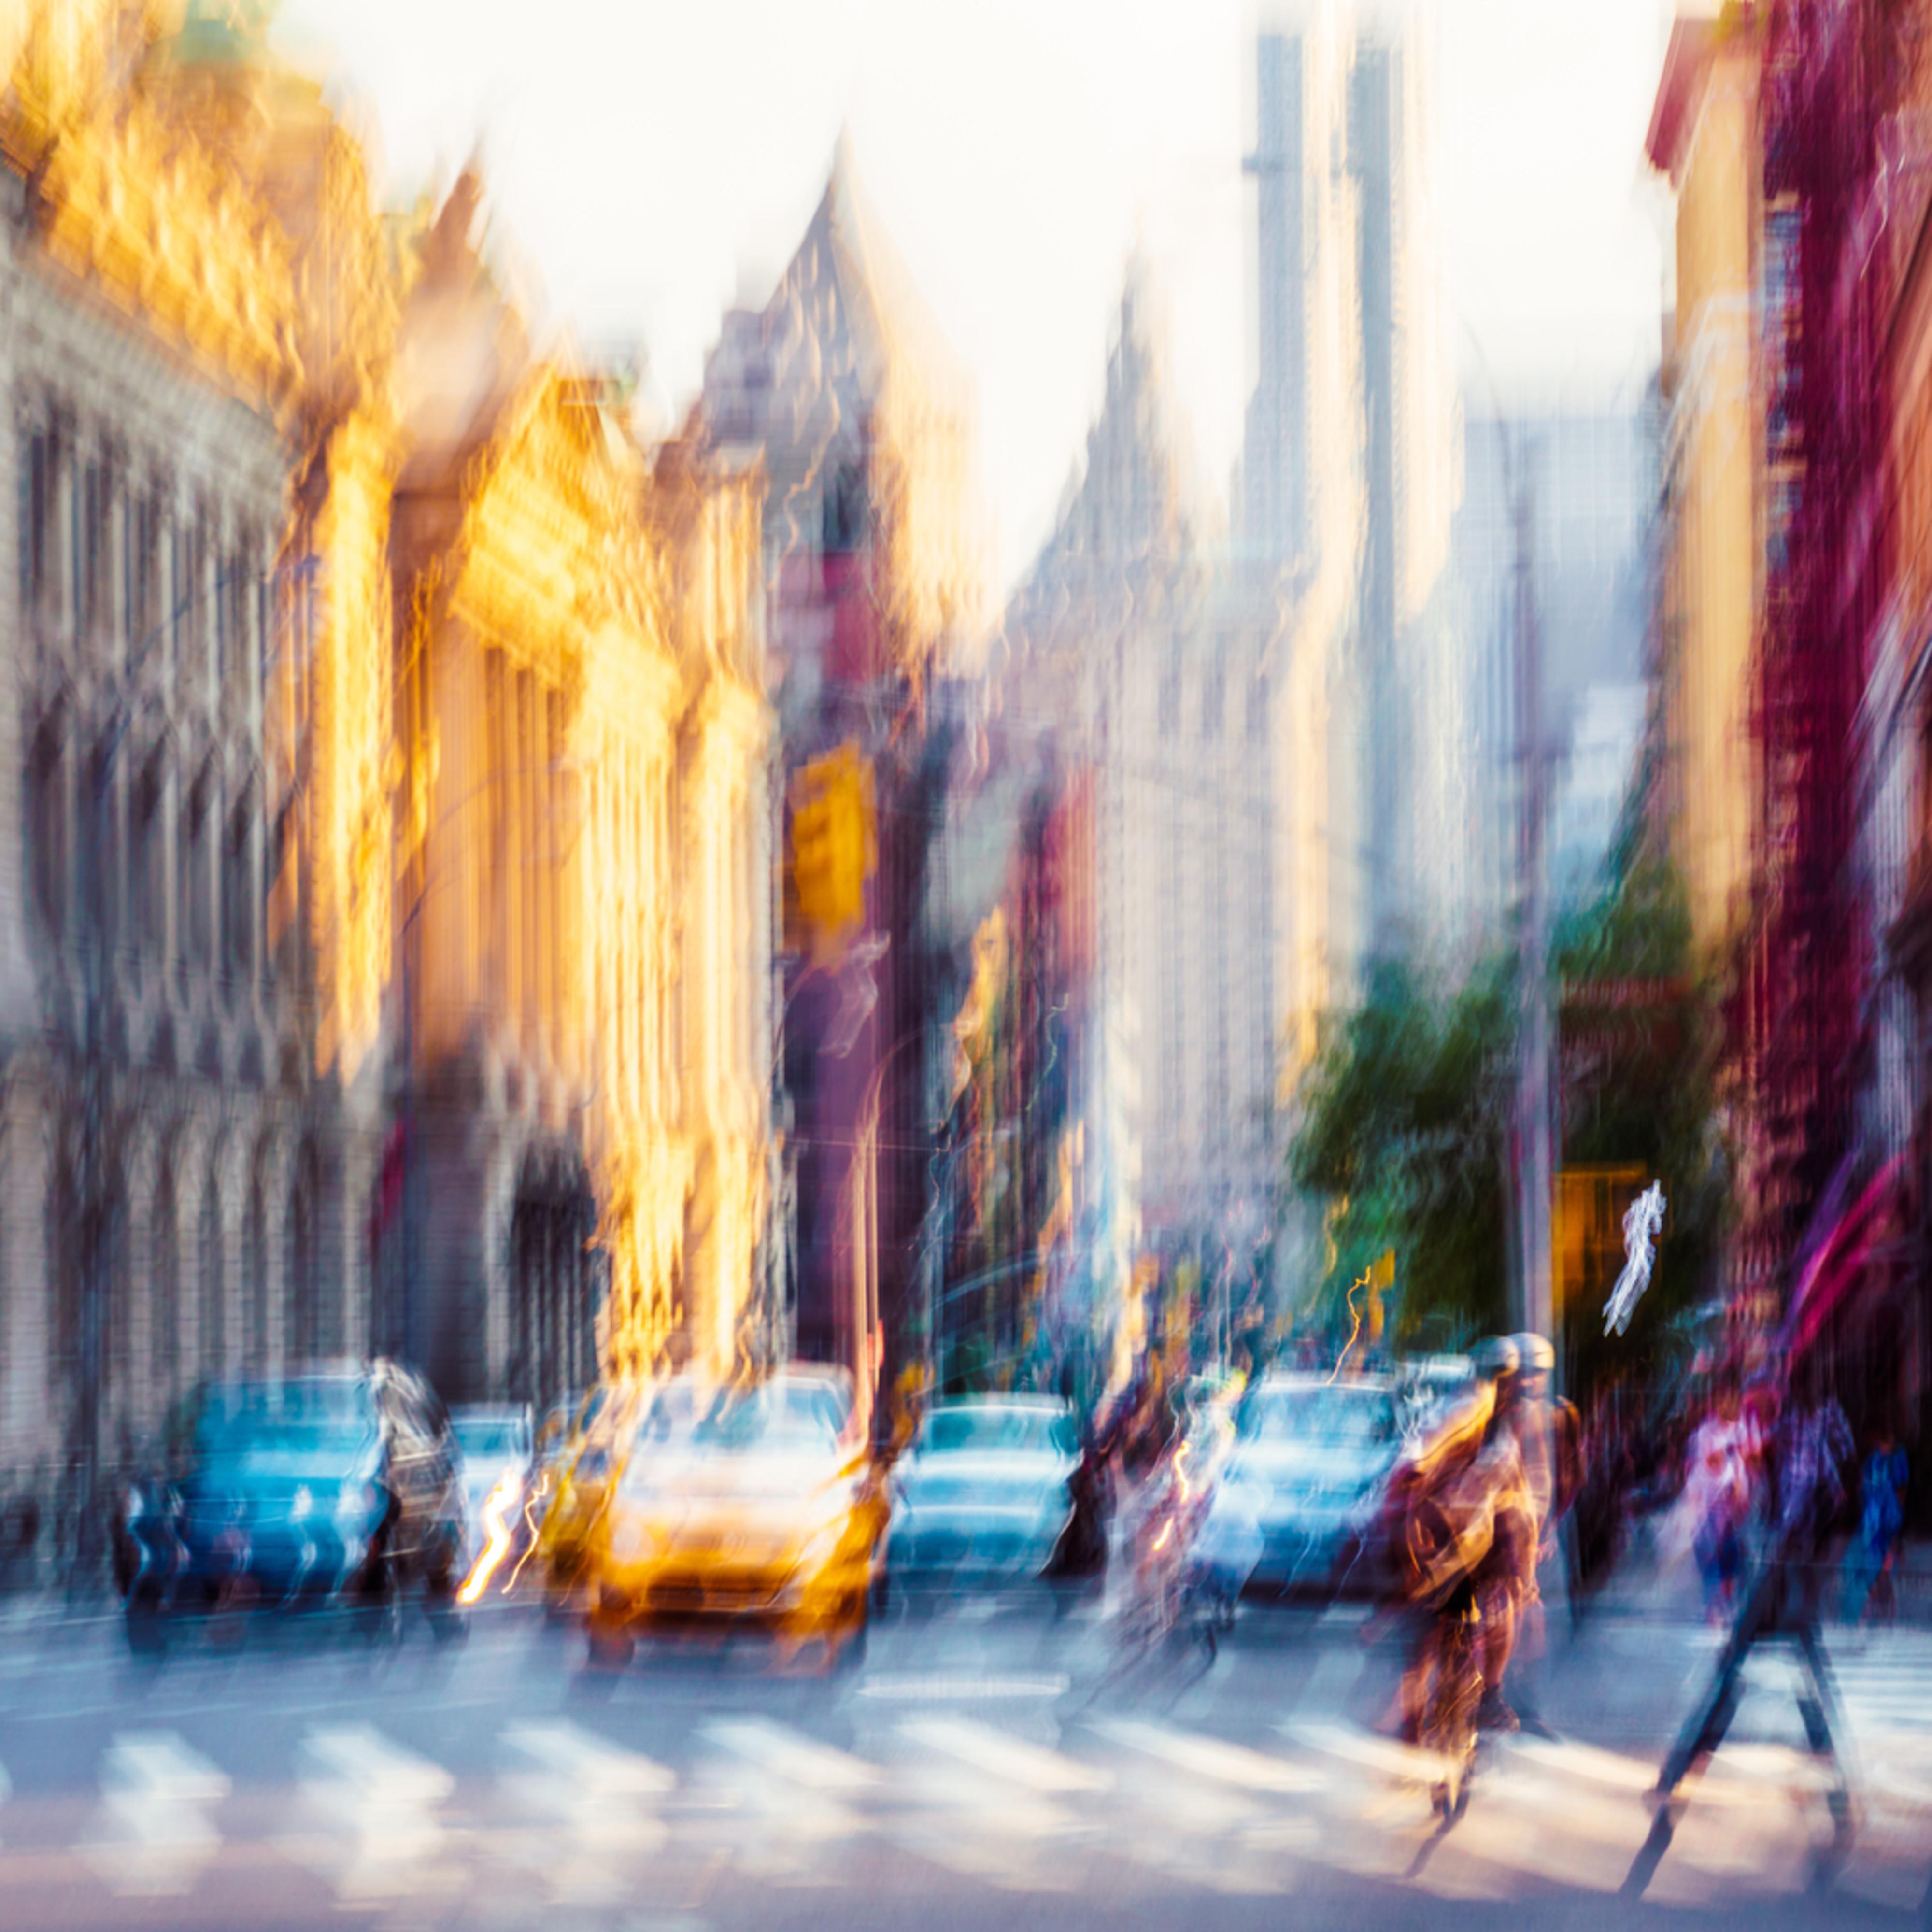 Travel abstract 05038 niovze